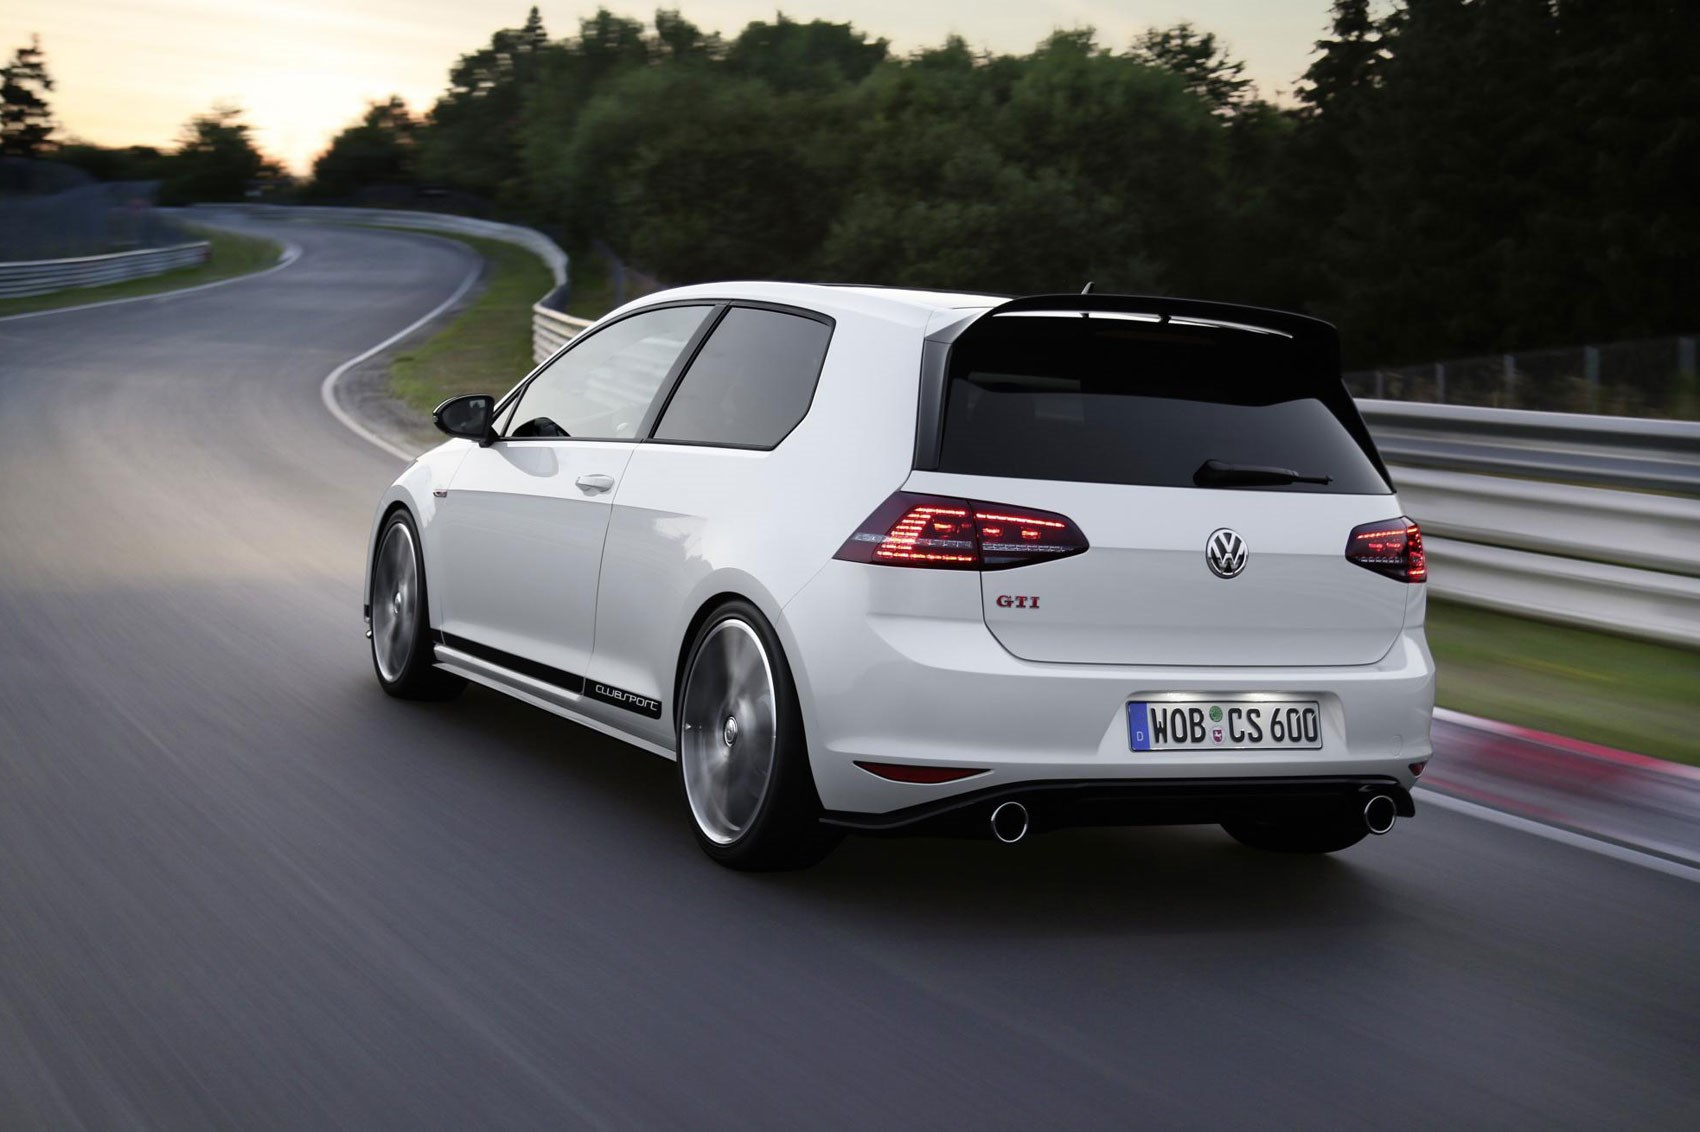 Volkswagen Golf GTI Clubsport Rear in Motion